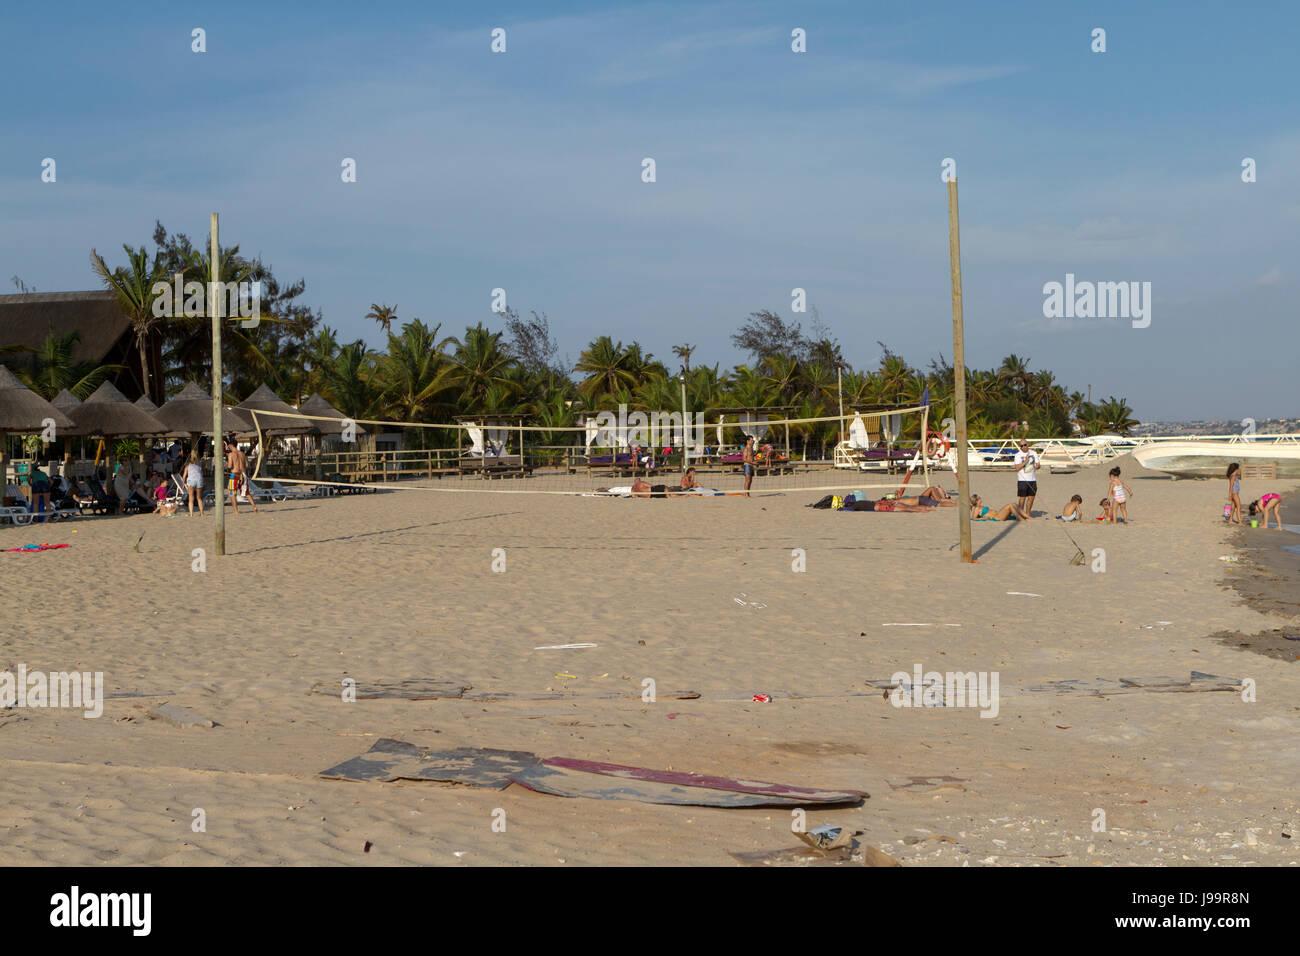 Mussulo island, Luanda Angola - Stock Image